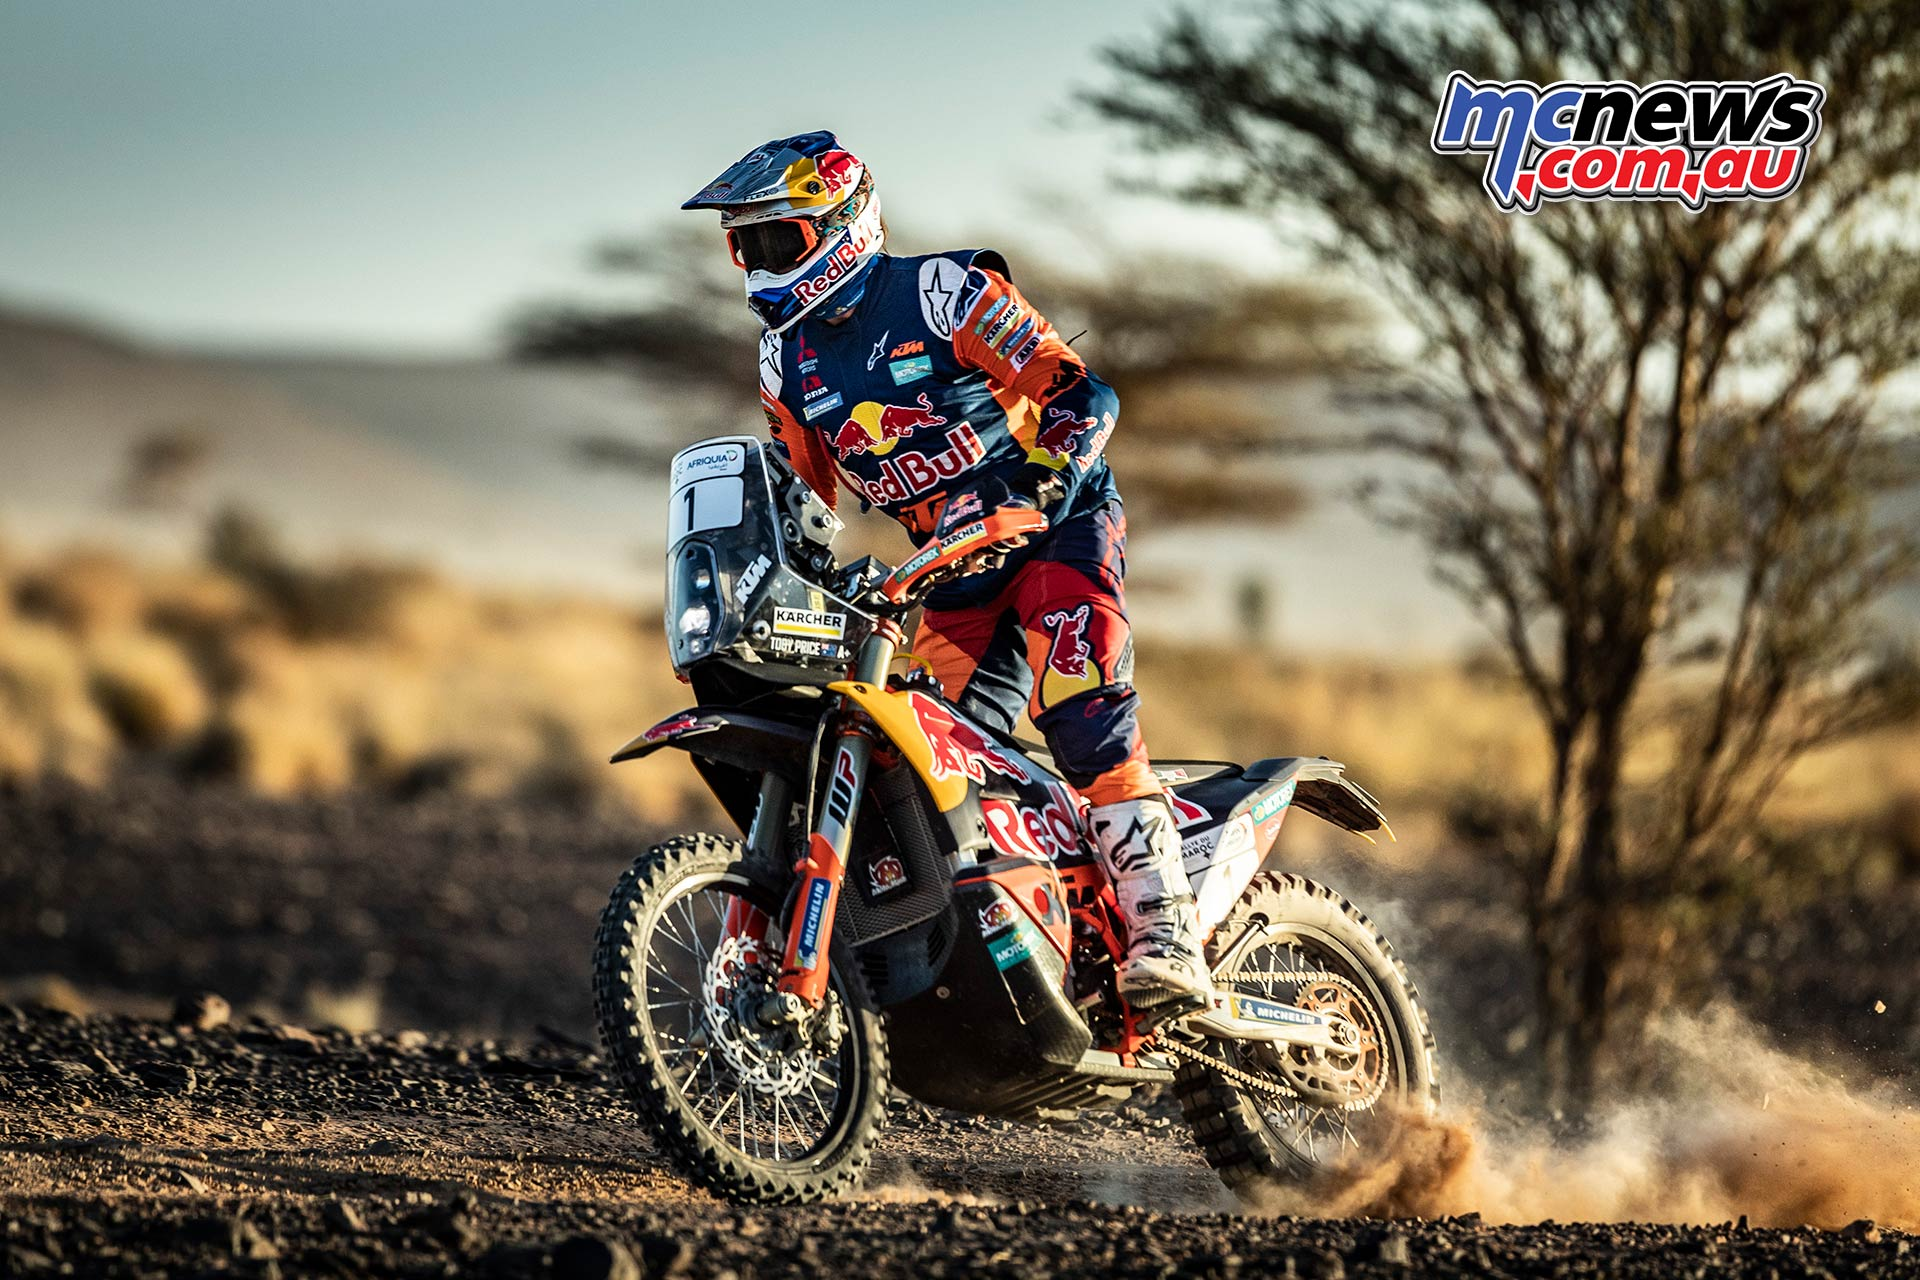 Rallye du Maroc Toby Price